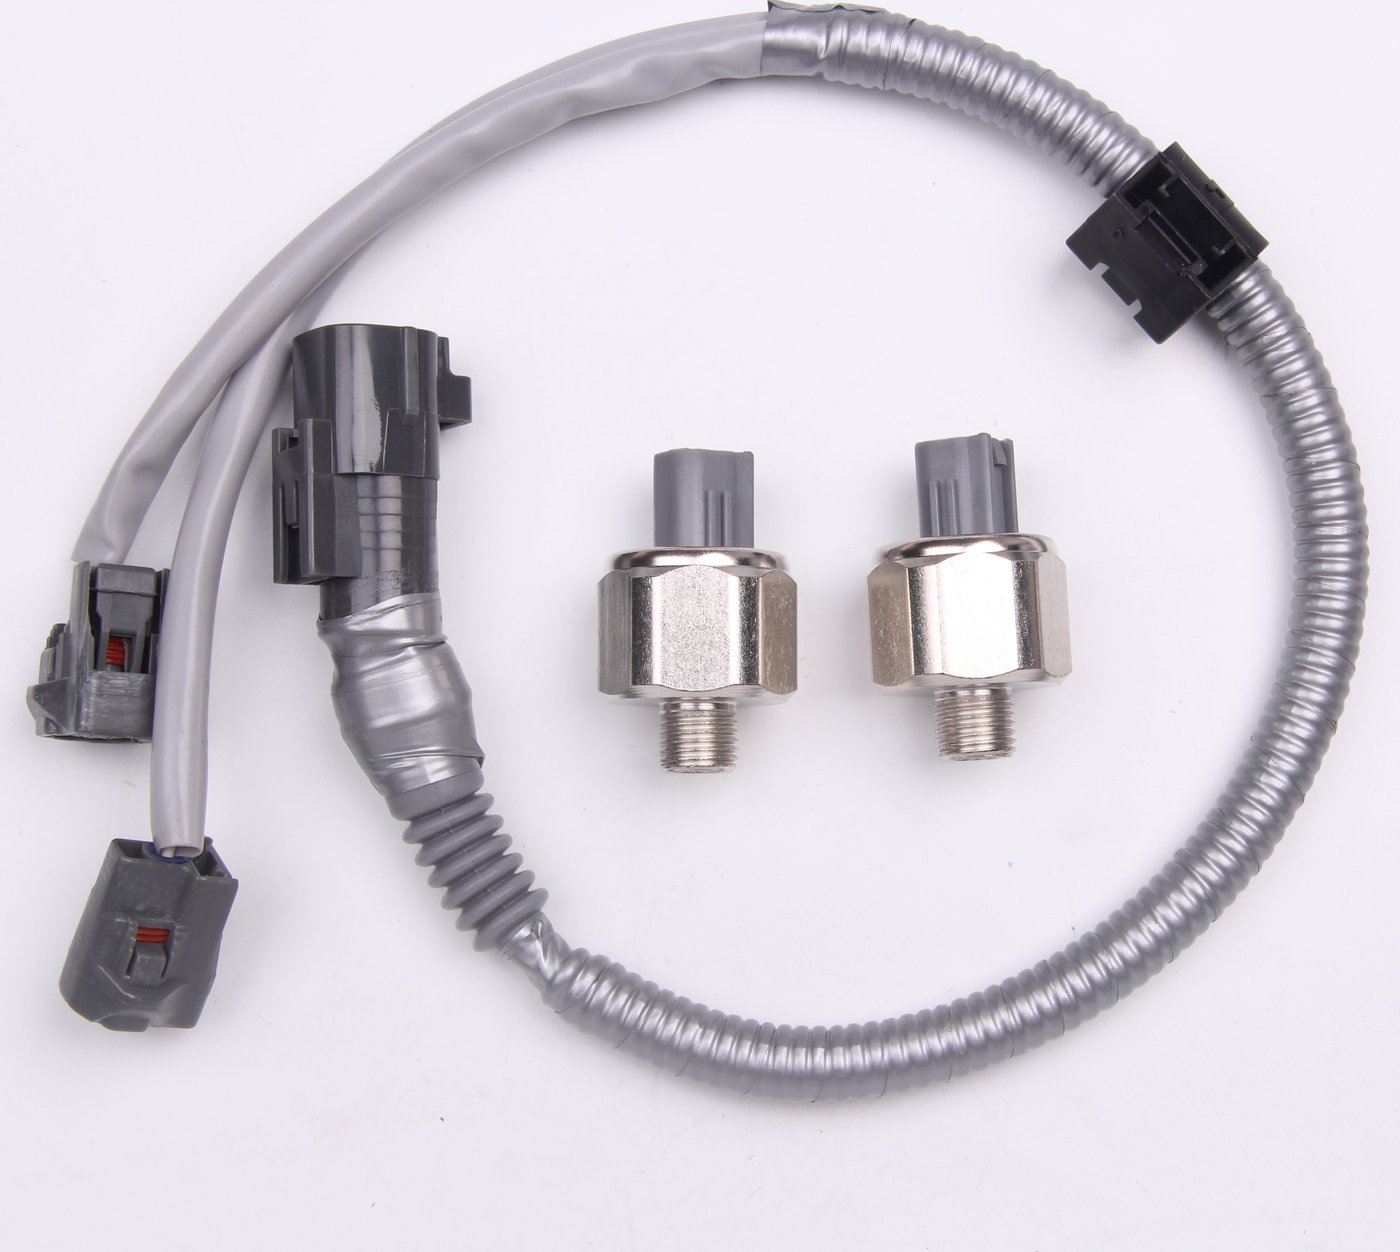 2 sets Knock Sensors & harness for TOYOTA LEXUS Avalon Camry ES300 89615-12090 Goodbest